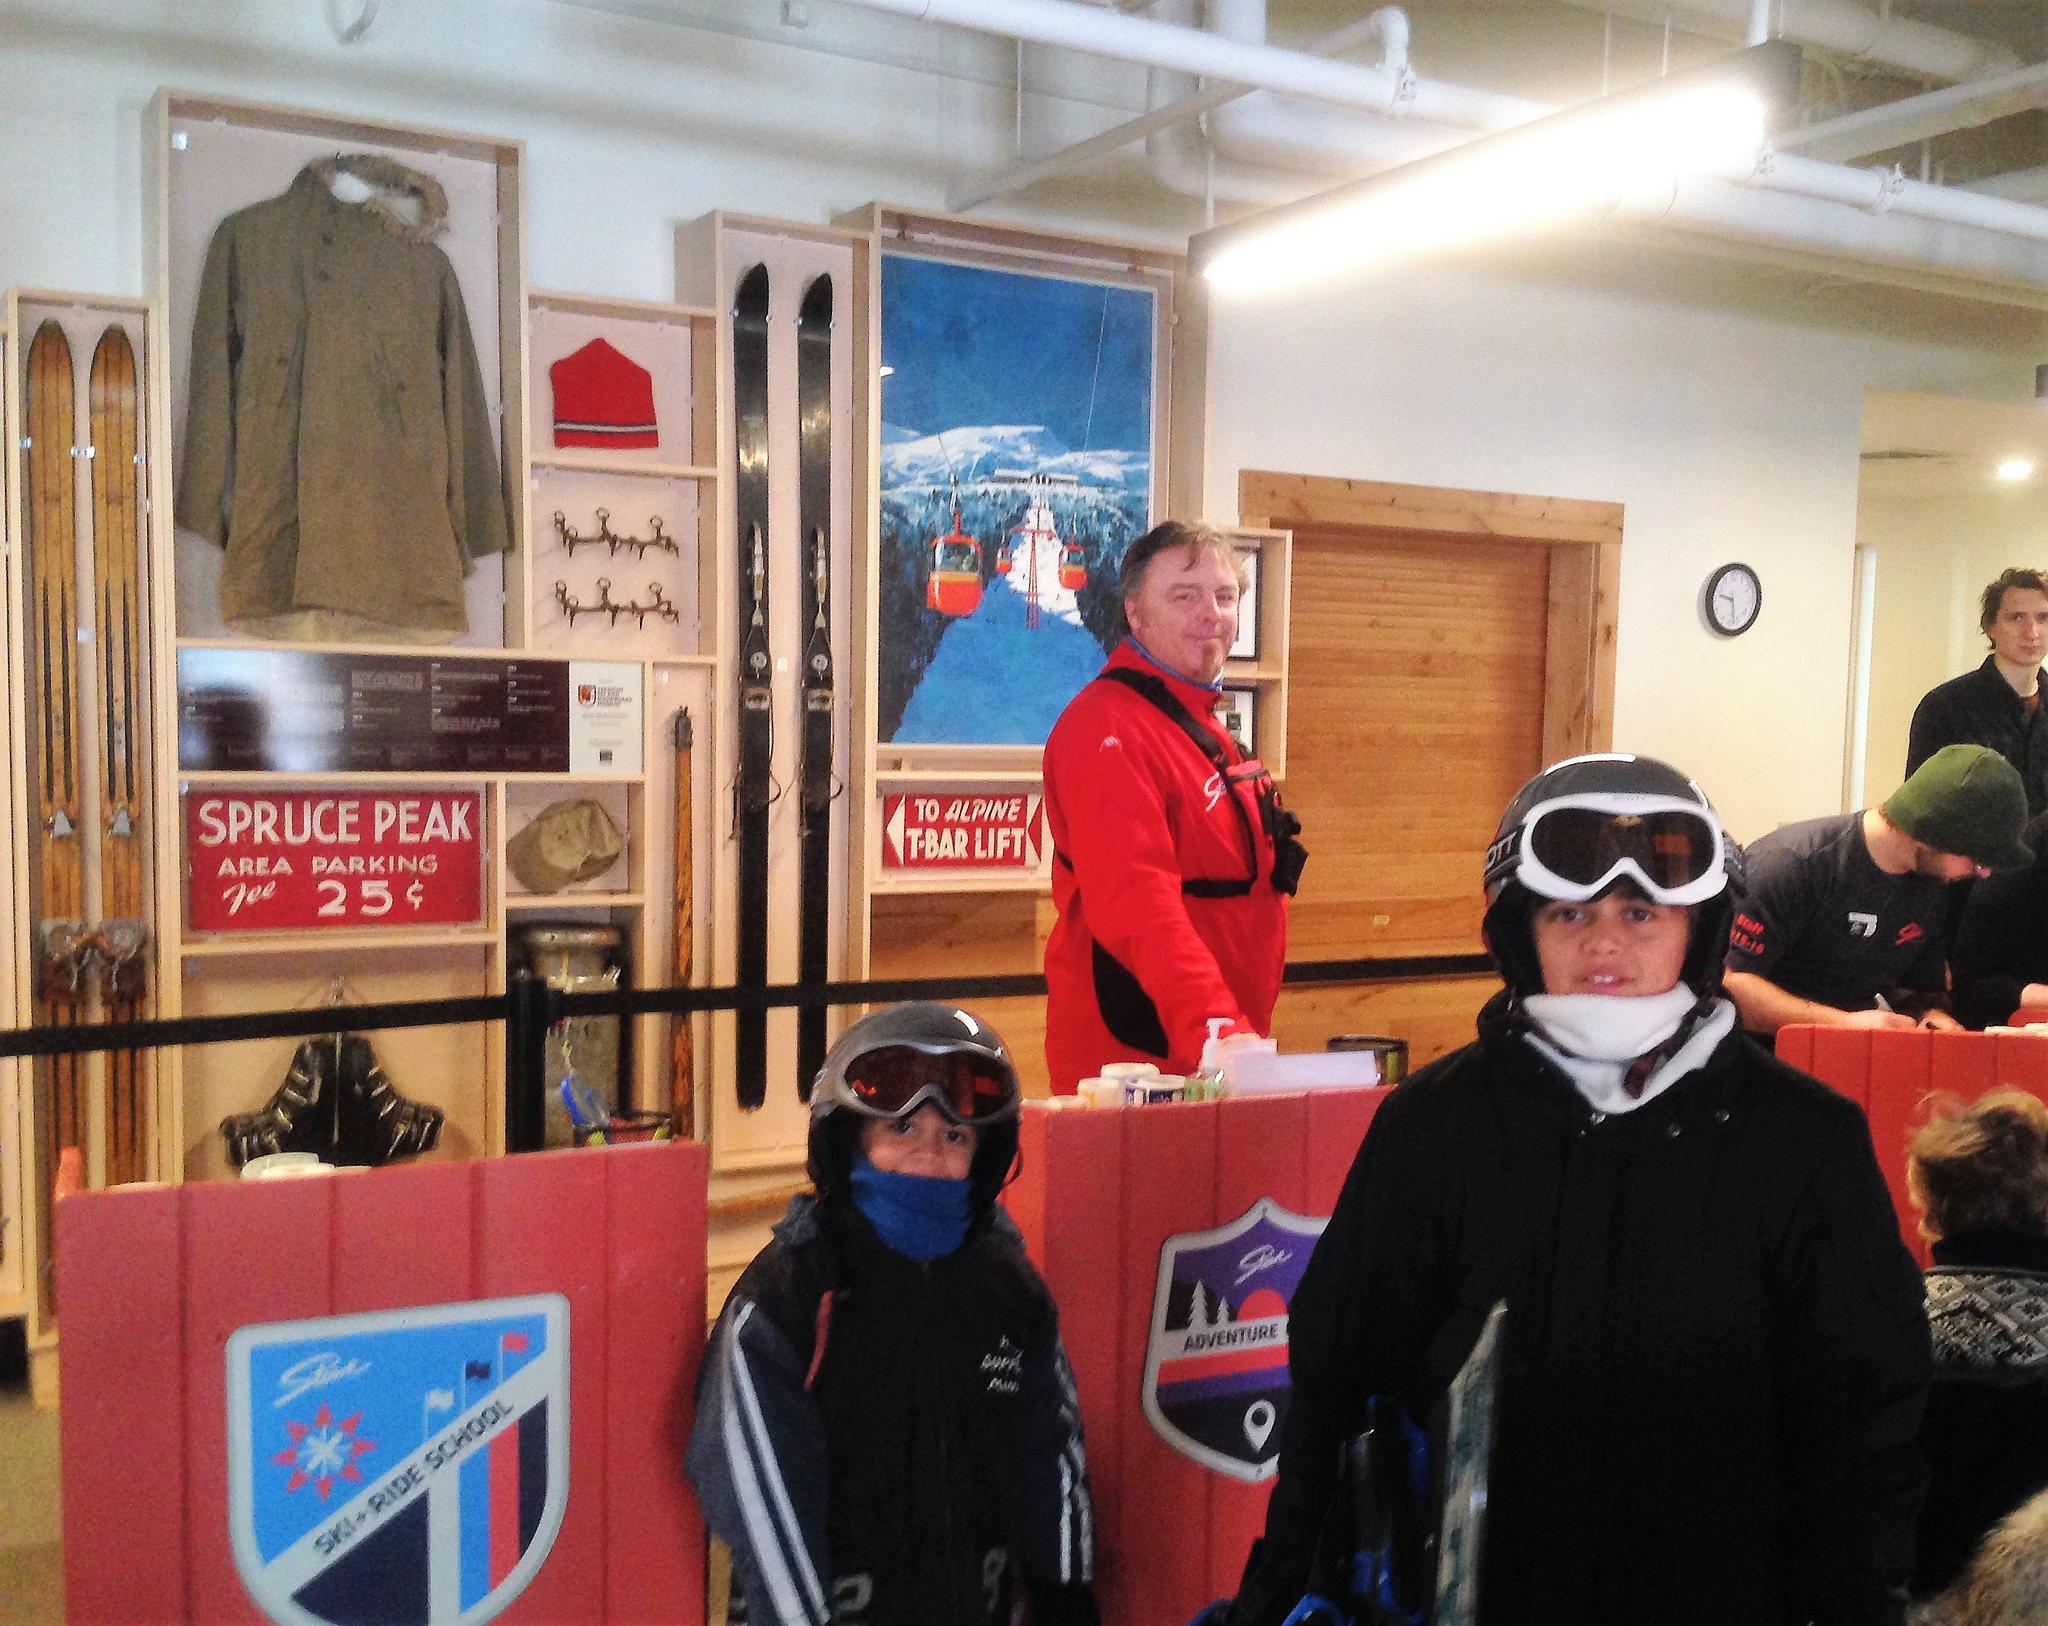 snowboarding school for kids - stowe vermont